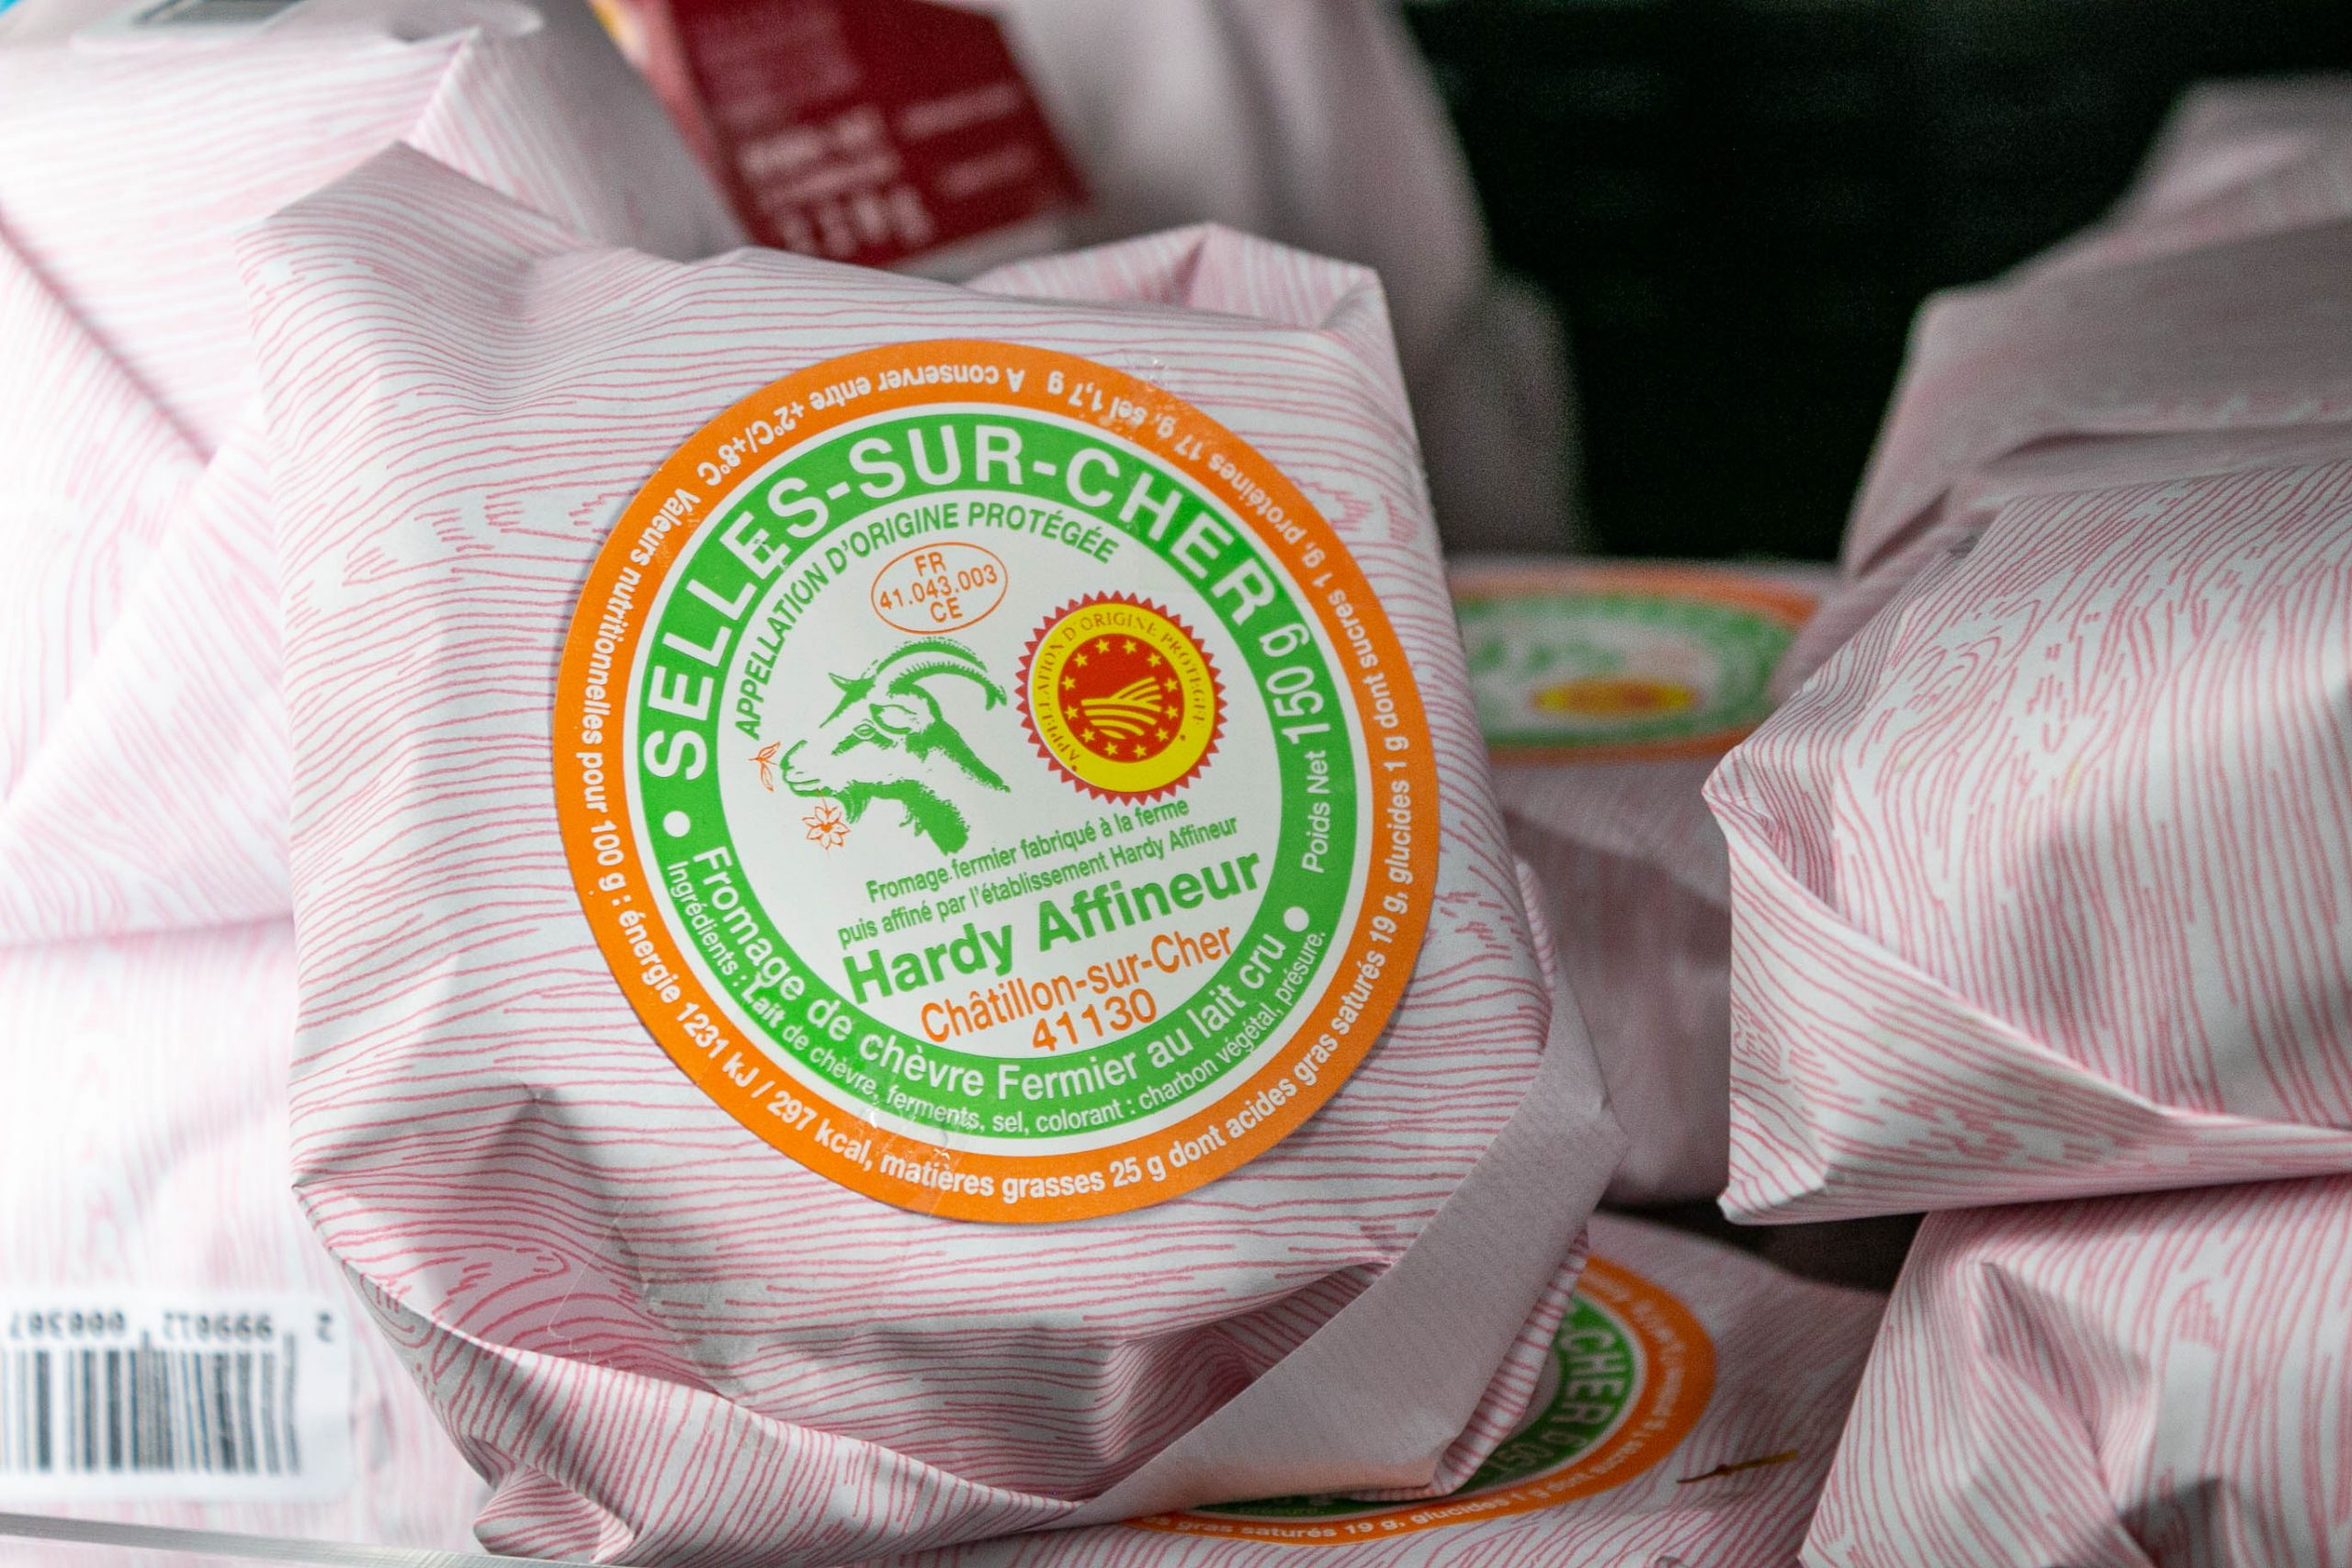 fromage fermier